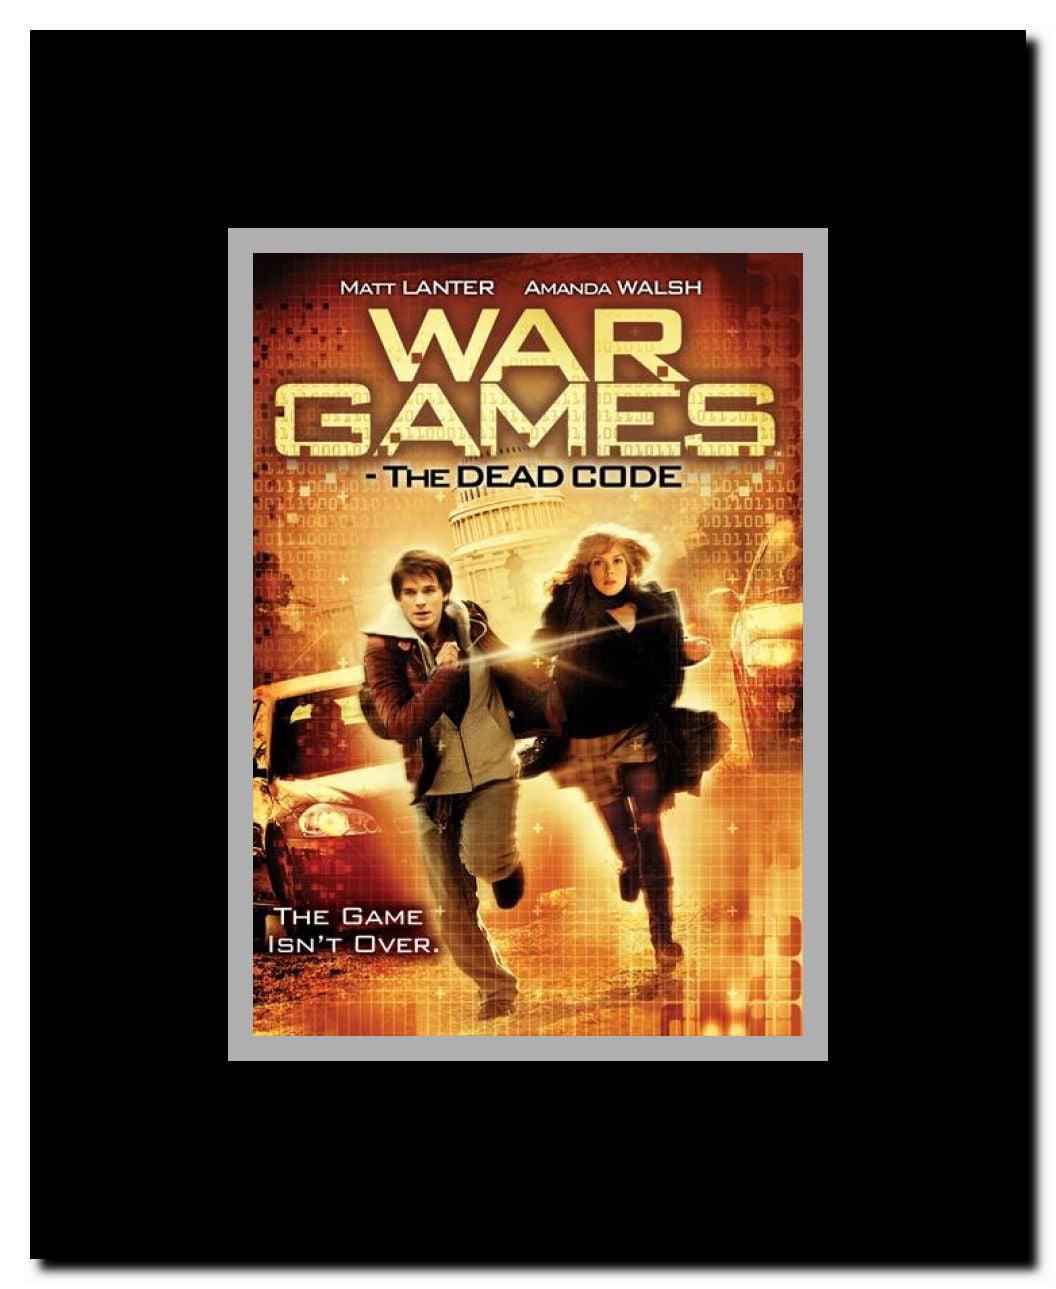 Wargames The Dead Code Framed Movie Poster Walmartcom